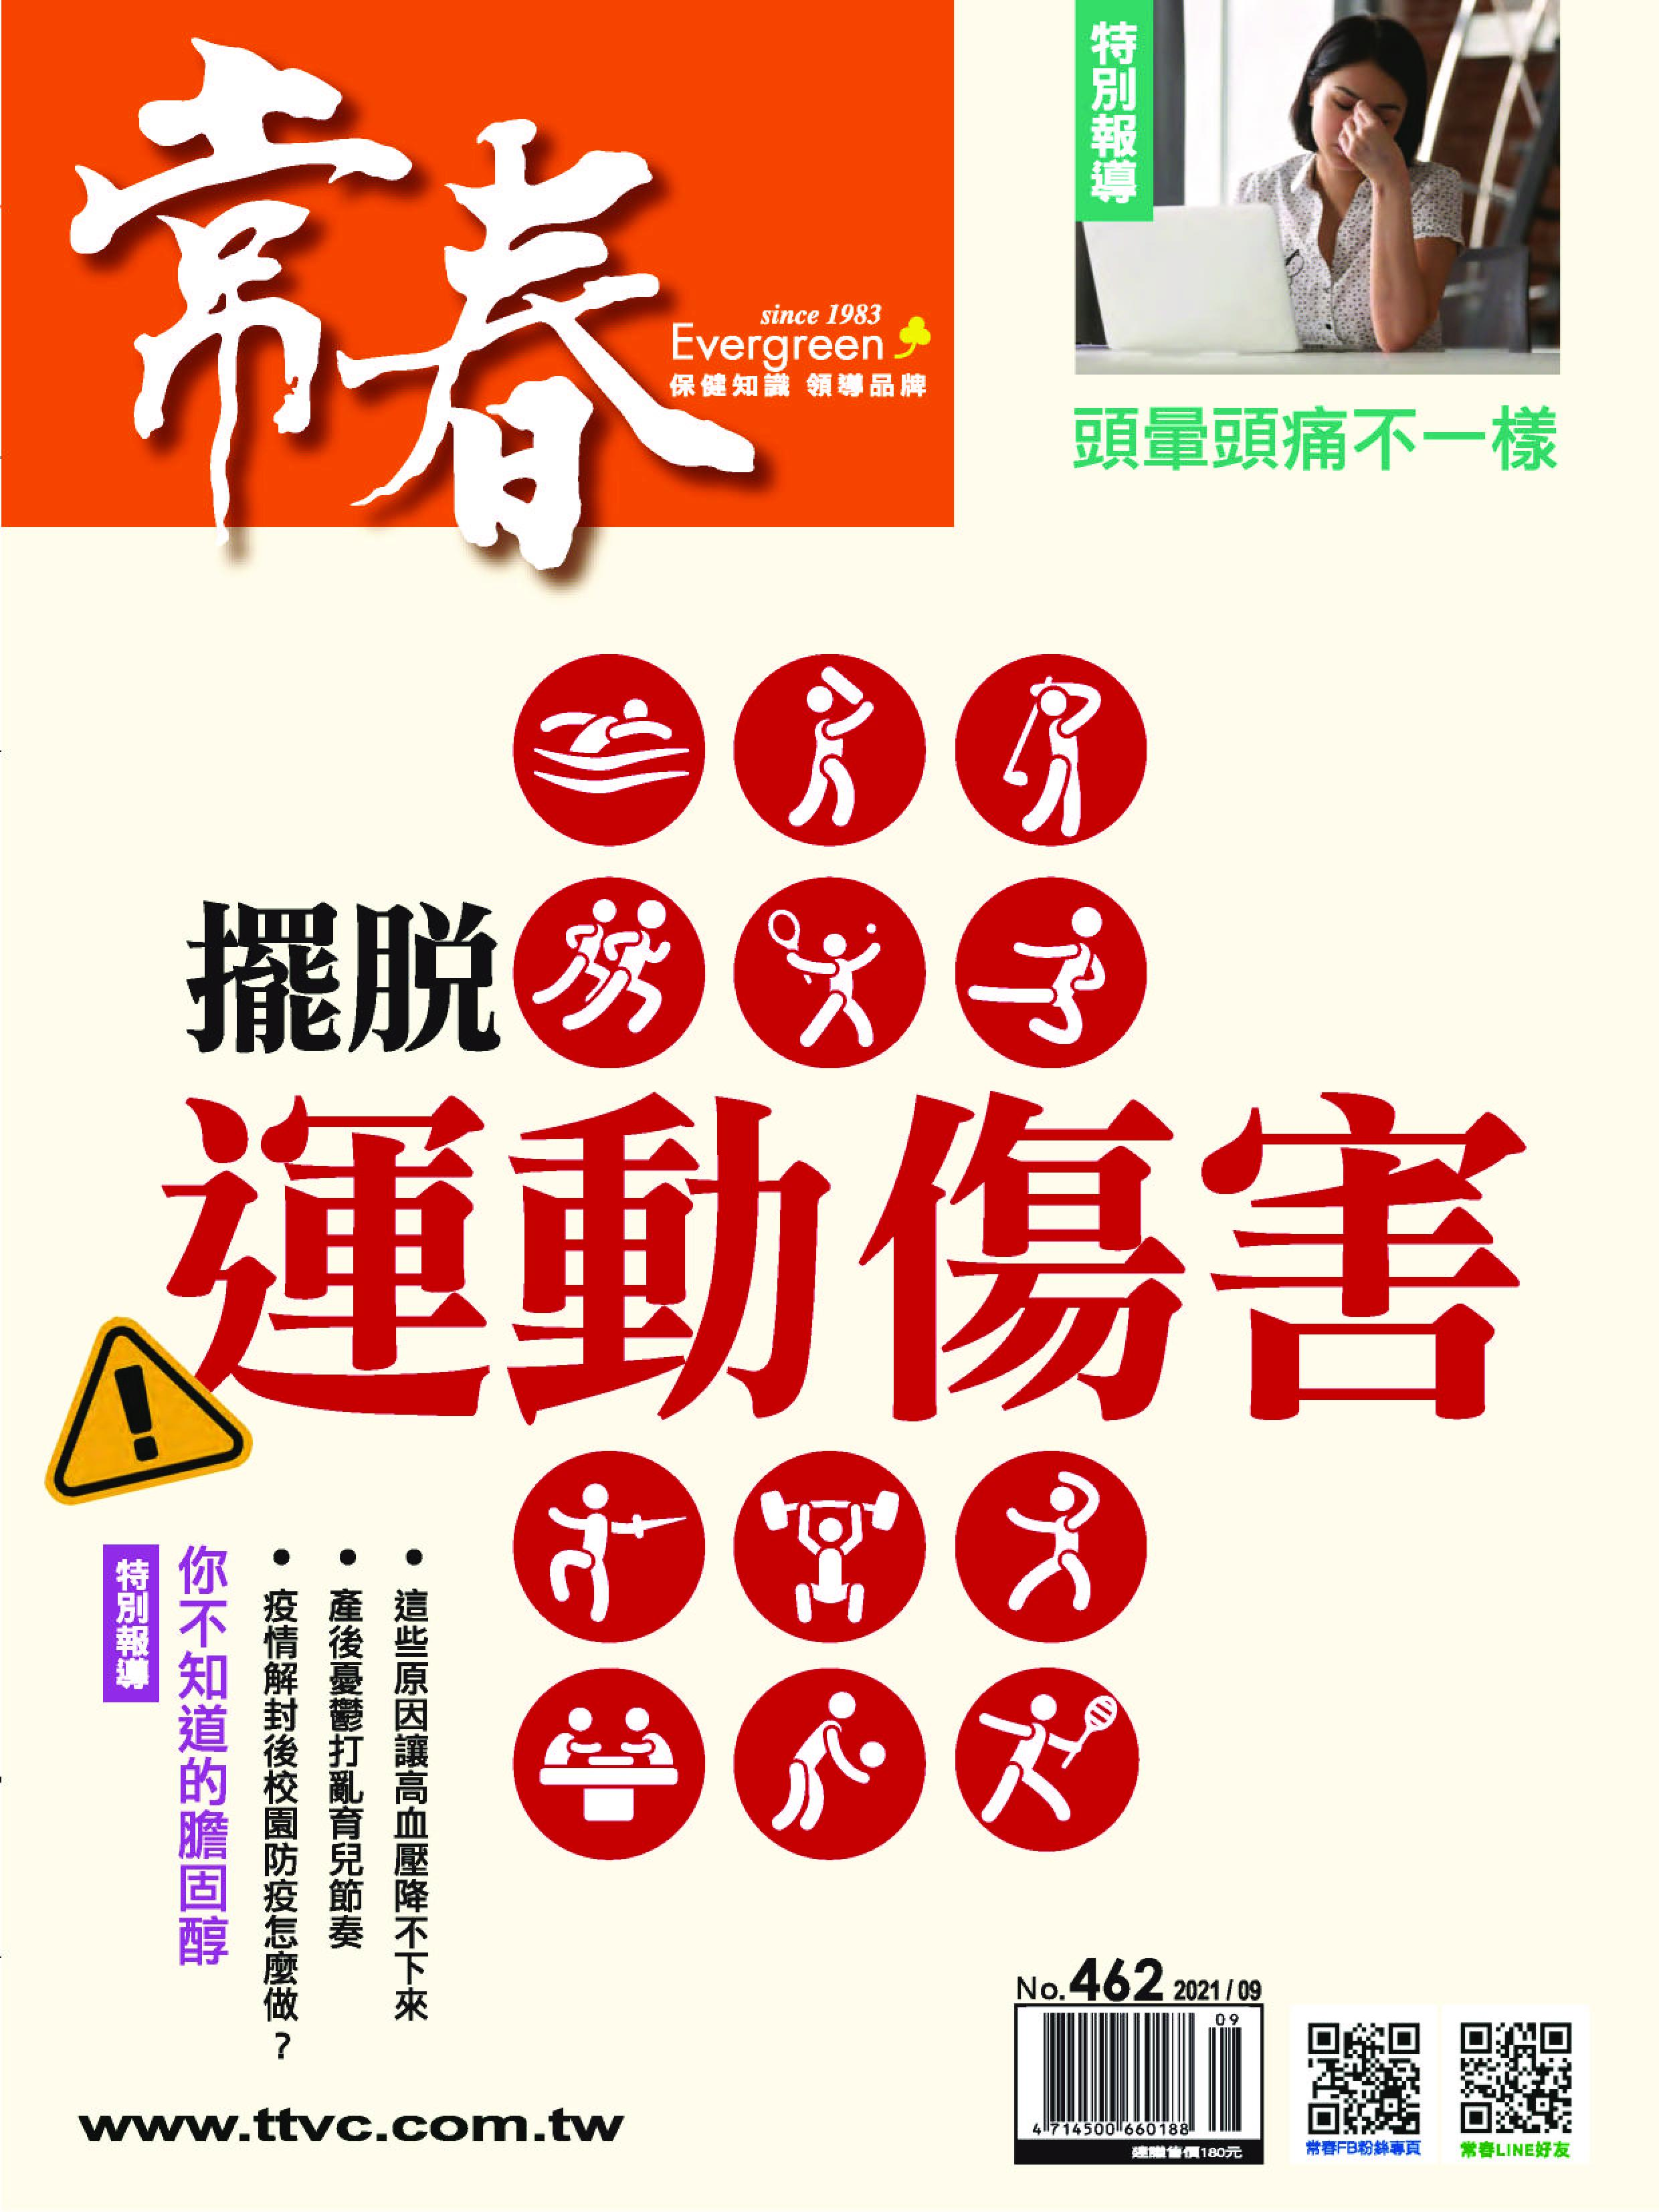 Evergreen 常春 - 九月 2021